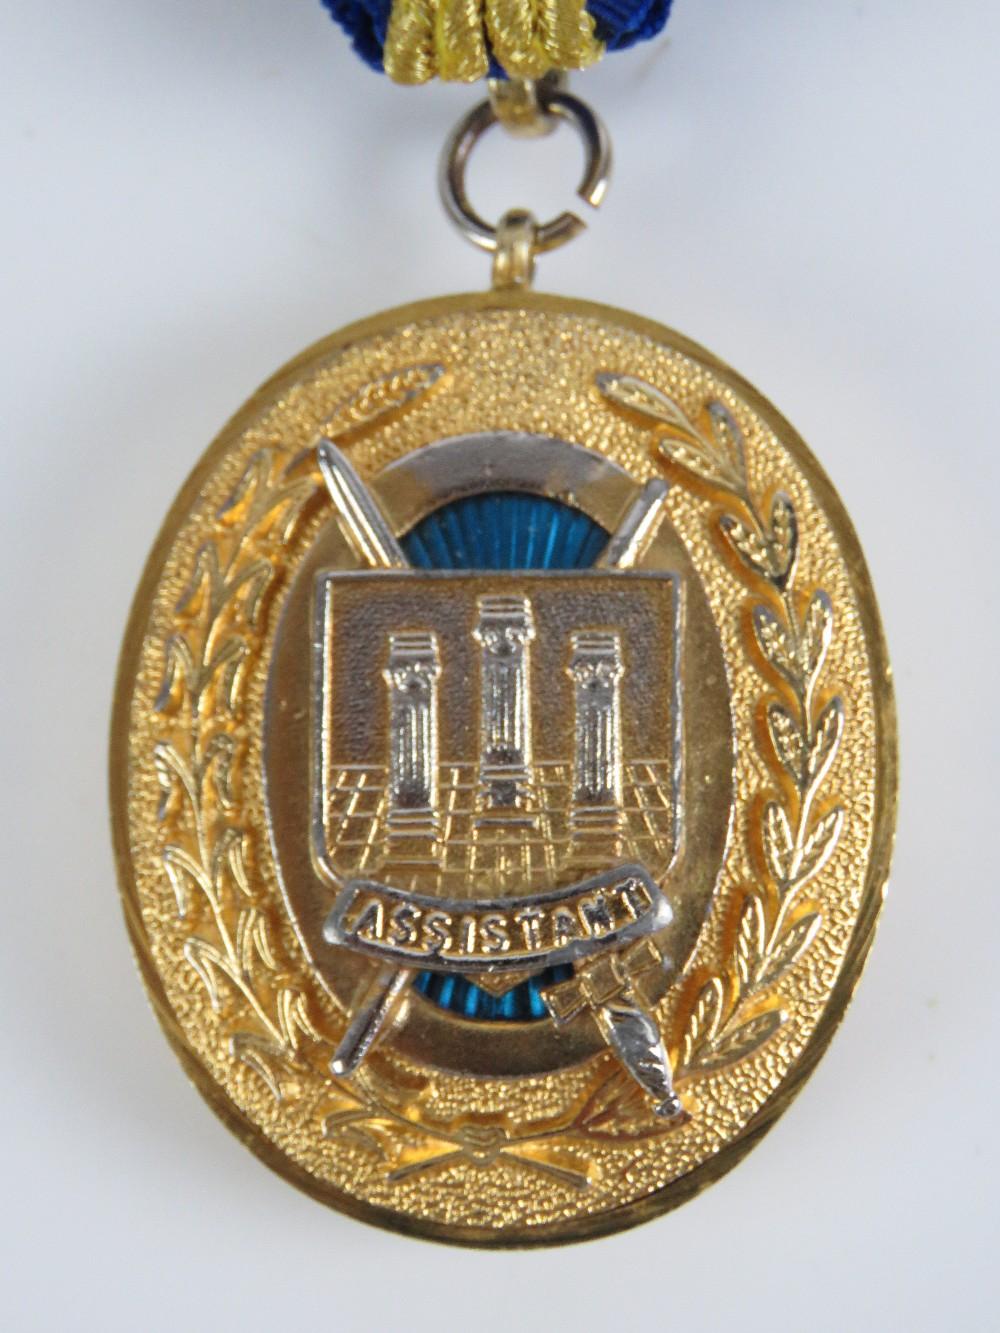 Lot 54 - Masonic; A Craft Grand Rank undress collar having sword bearer assistant jewel upon.